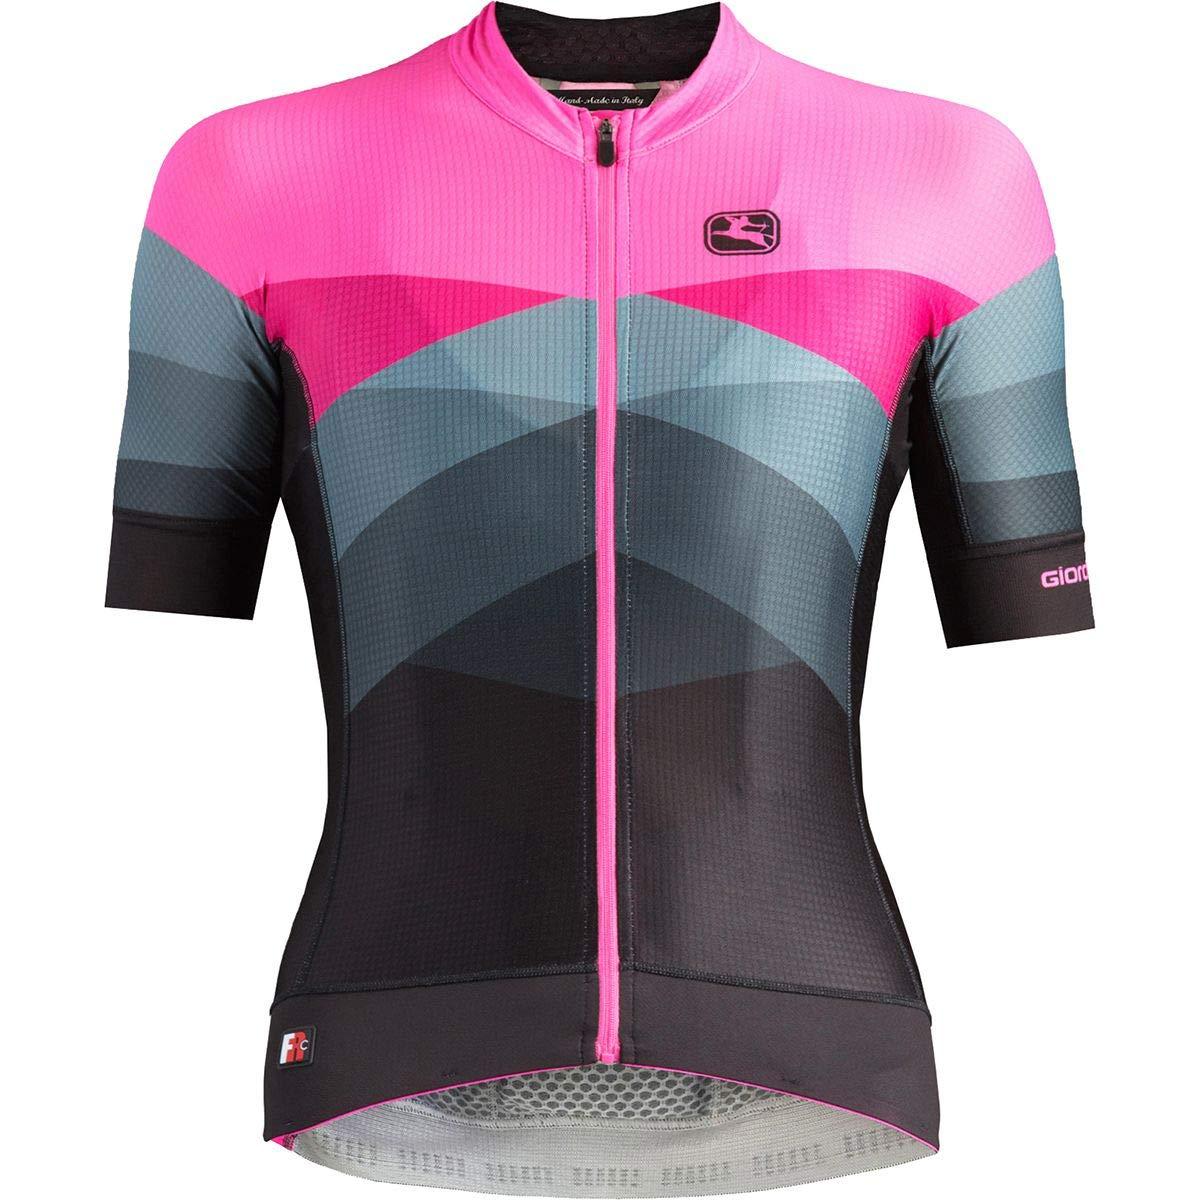 Giordana Moda FR-C Pro Short-Sleeve Jersey - Women's Dolomiti/Pink, XS